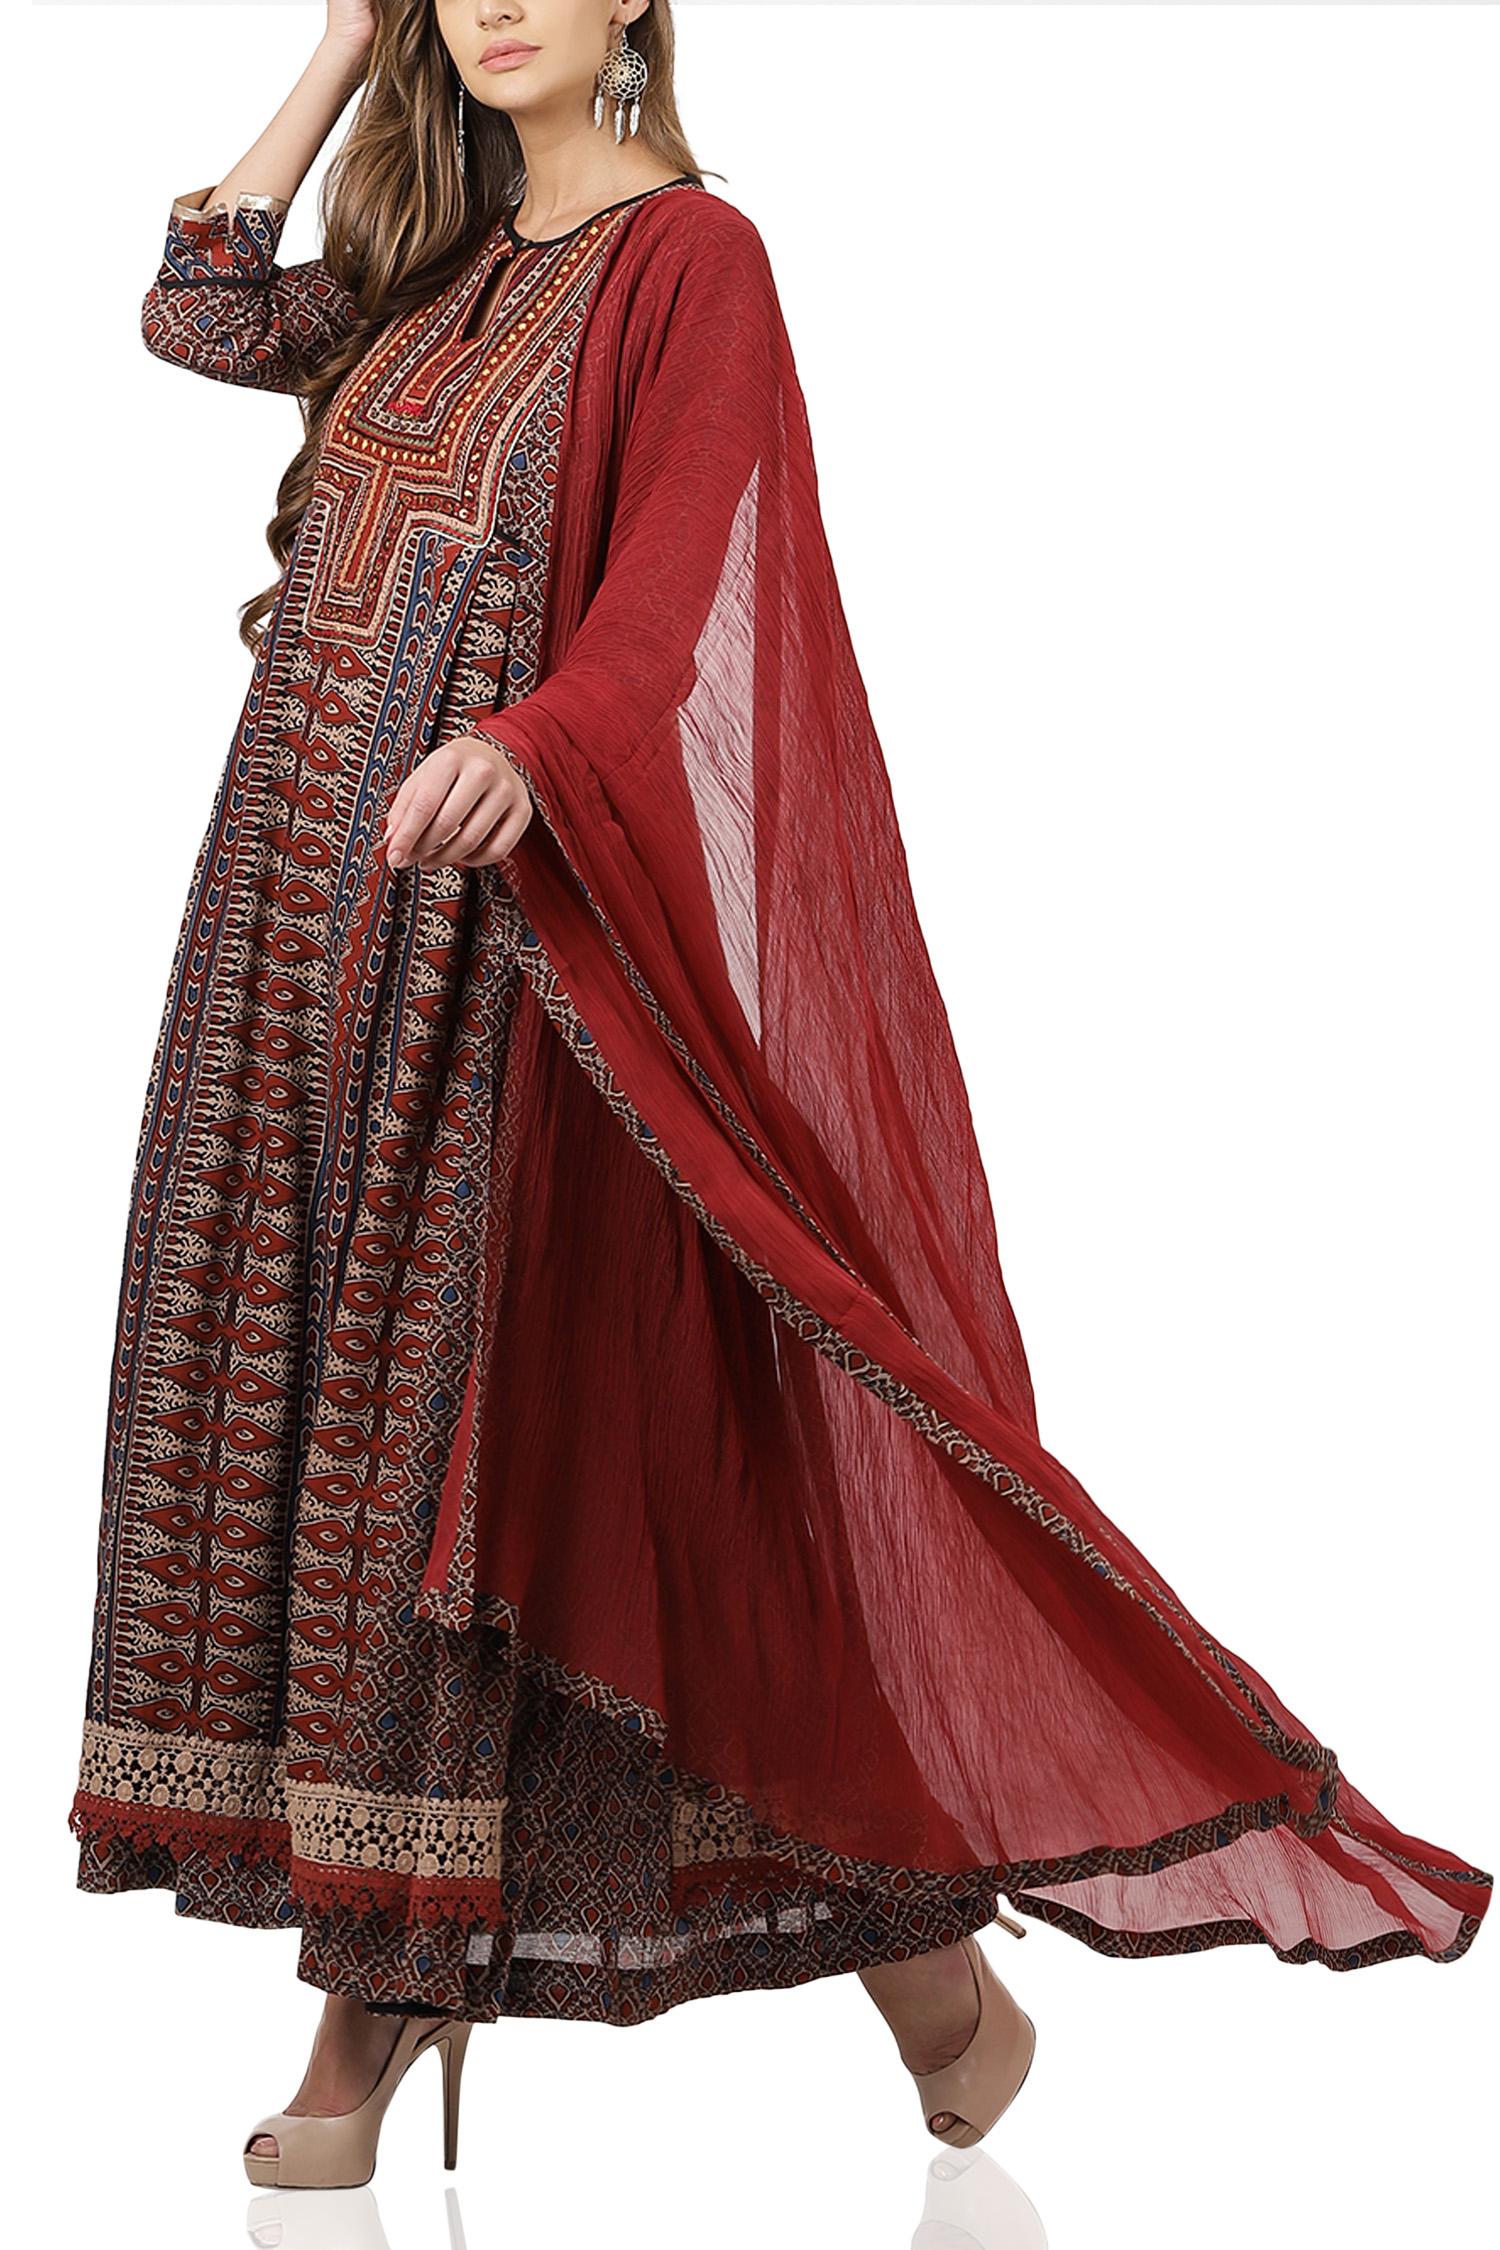 ritu kumar, festive wear, festival outfit ideas, layered suit design and ideas, affordable festive wear, affordable festival outfit ideas